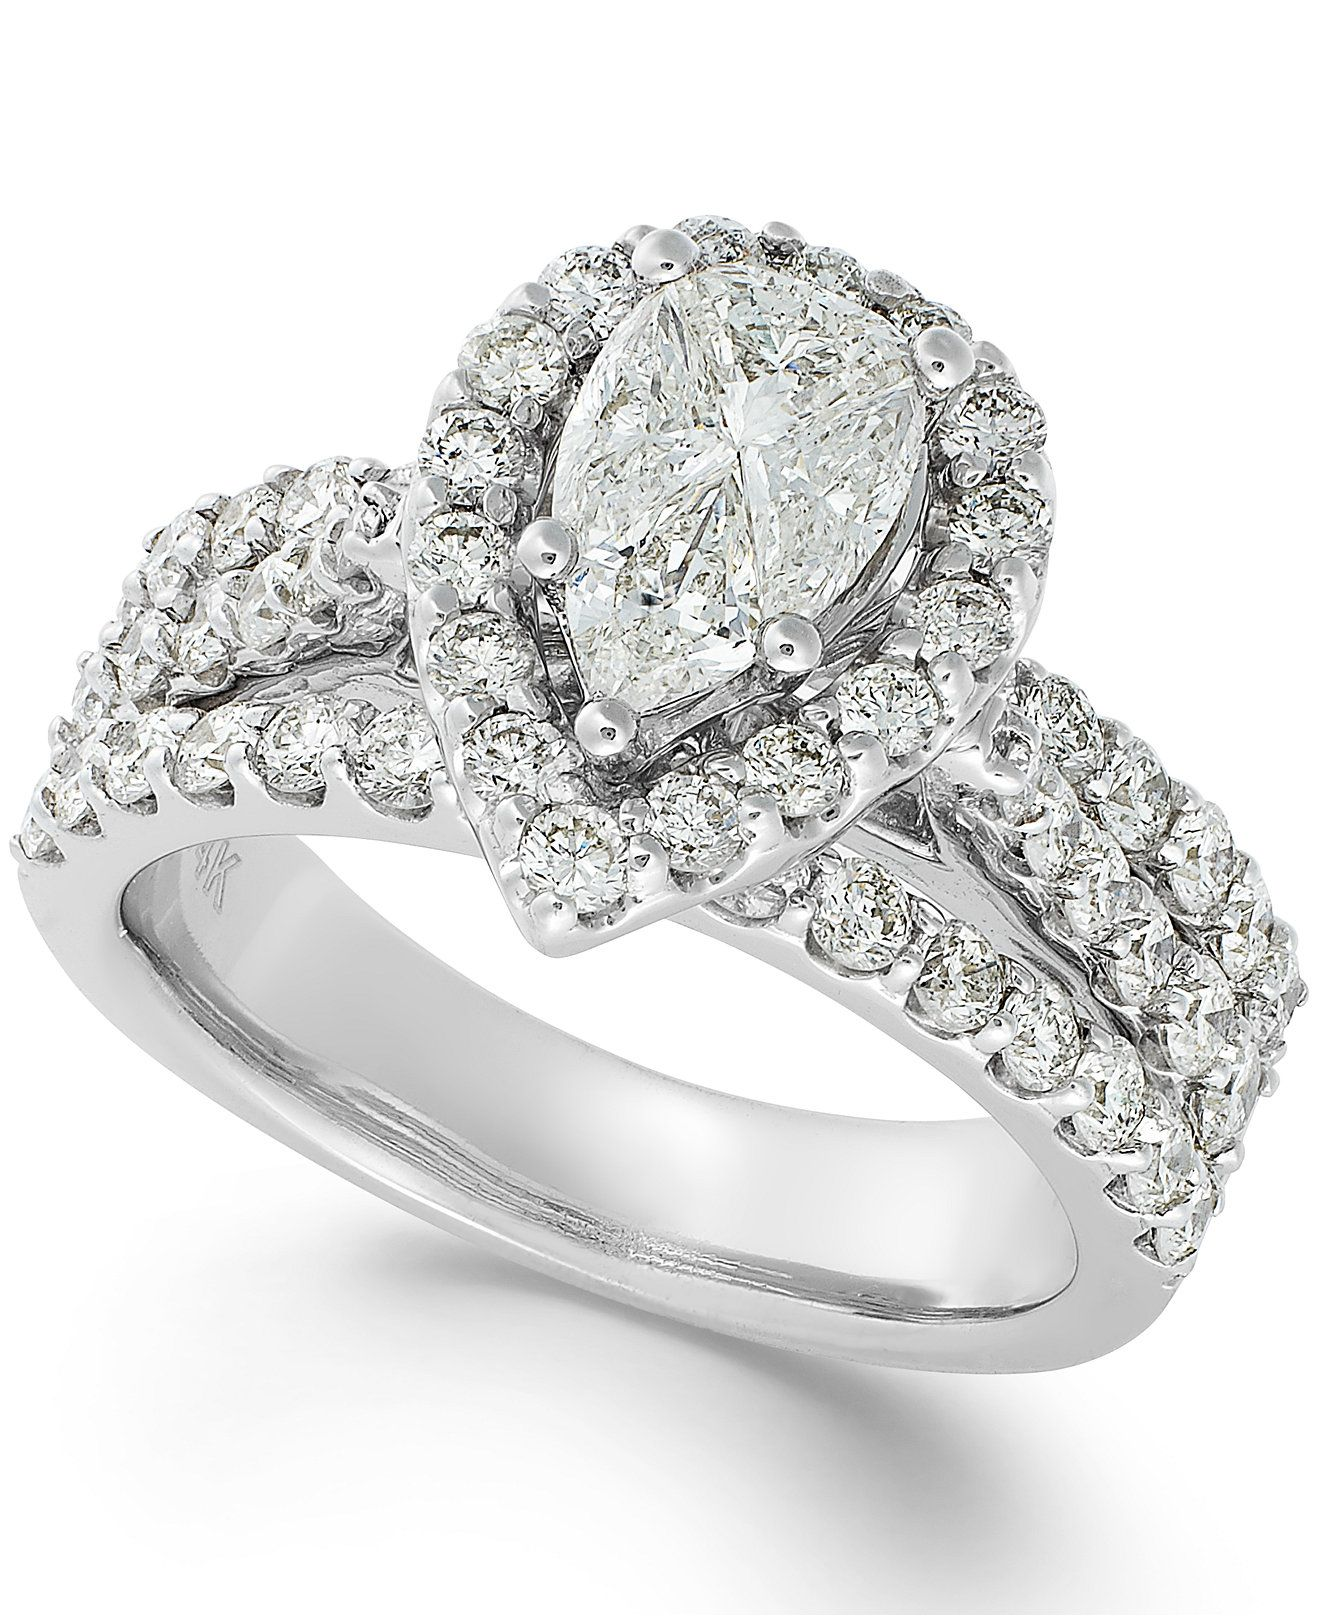 33++ Macys jewelry engagement rings viral